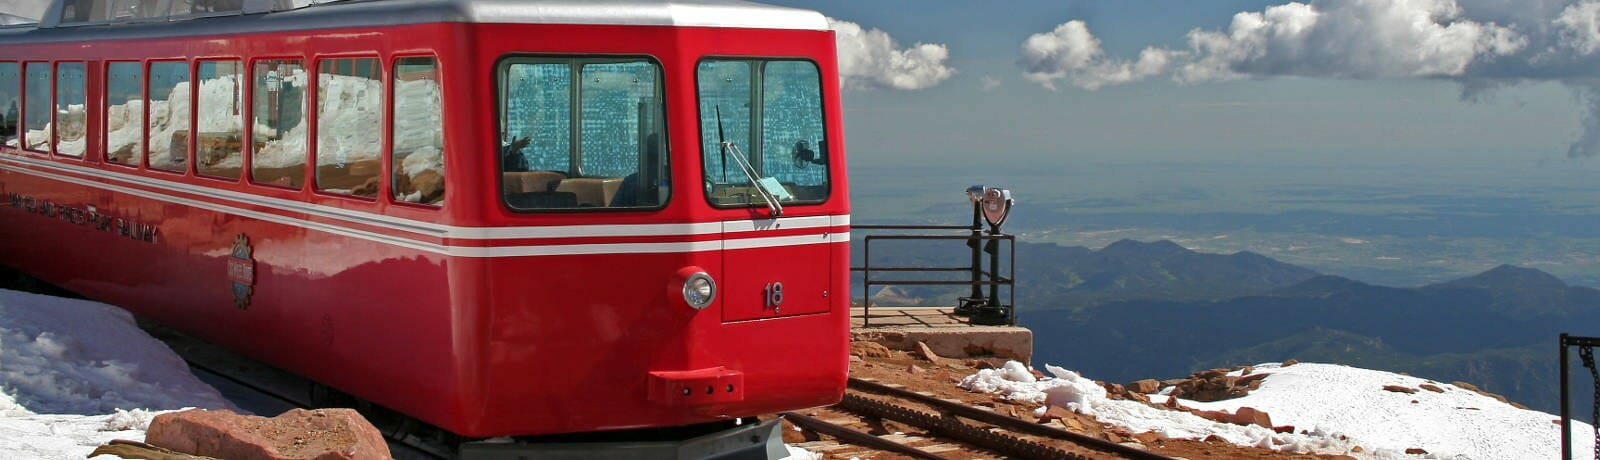 Pikes Peak railcar